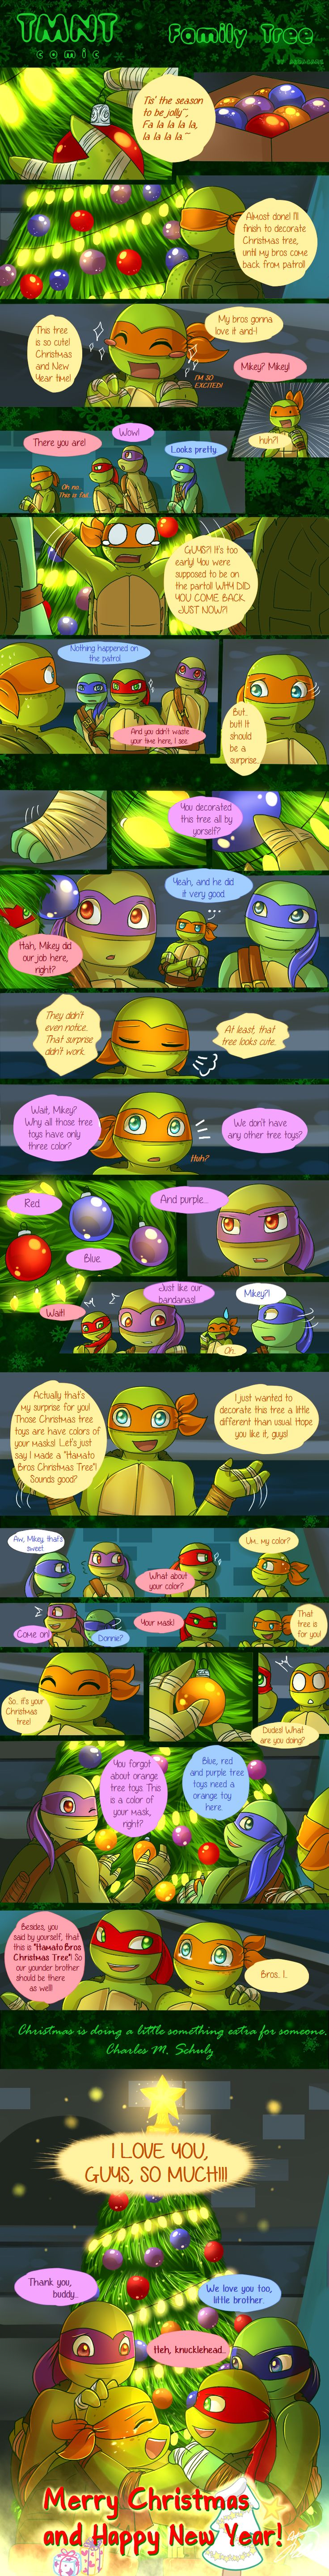 .: TMNT comic - Family Tree :. by AquaGame.deviantart.com on @DeviantArt